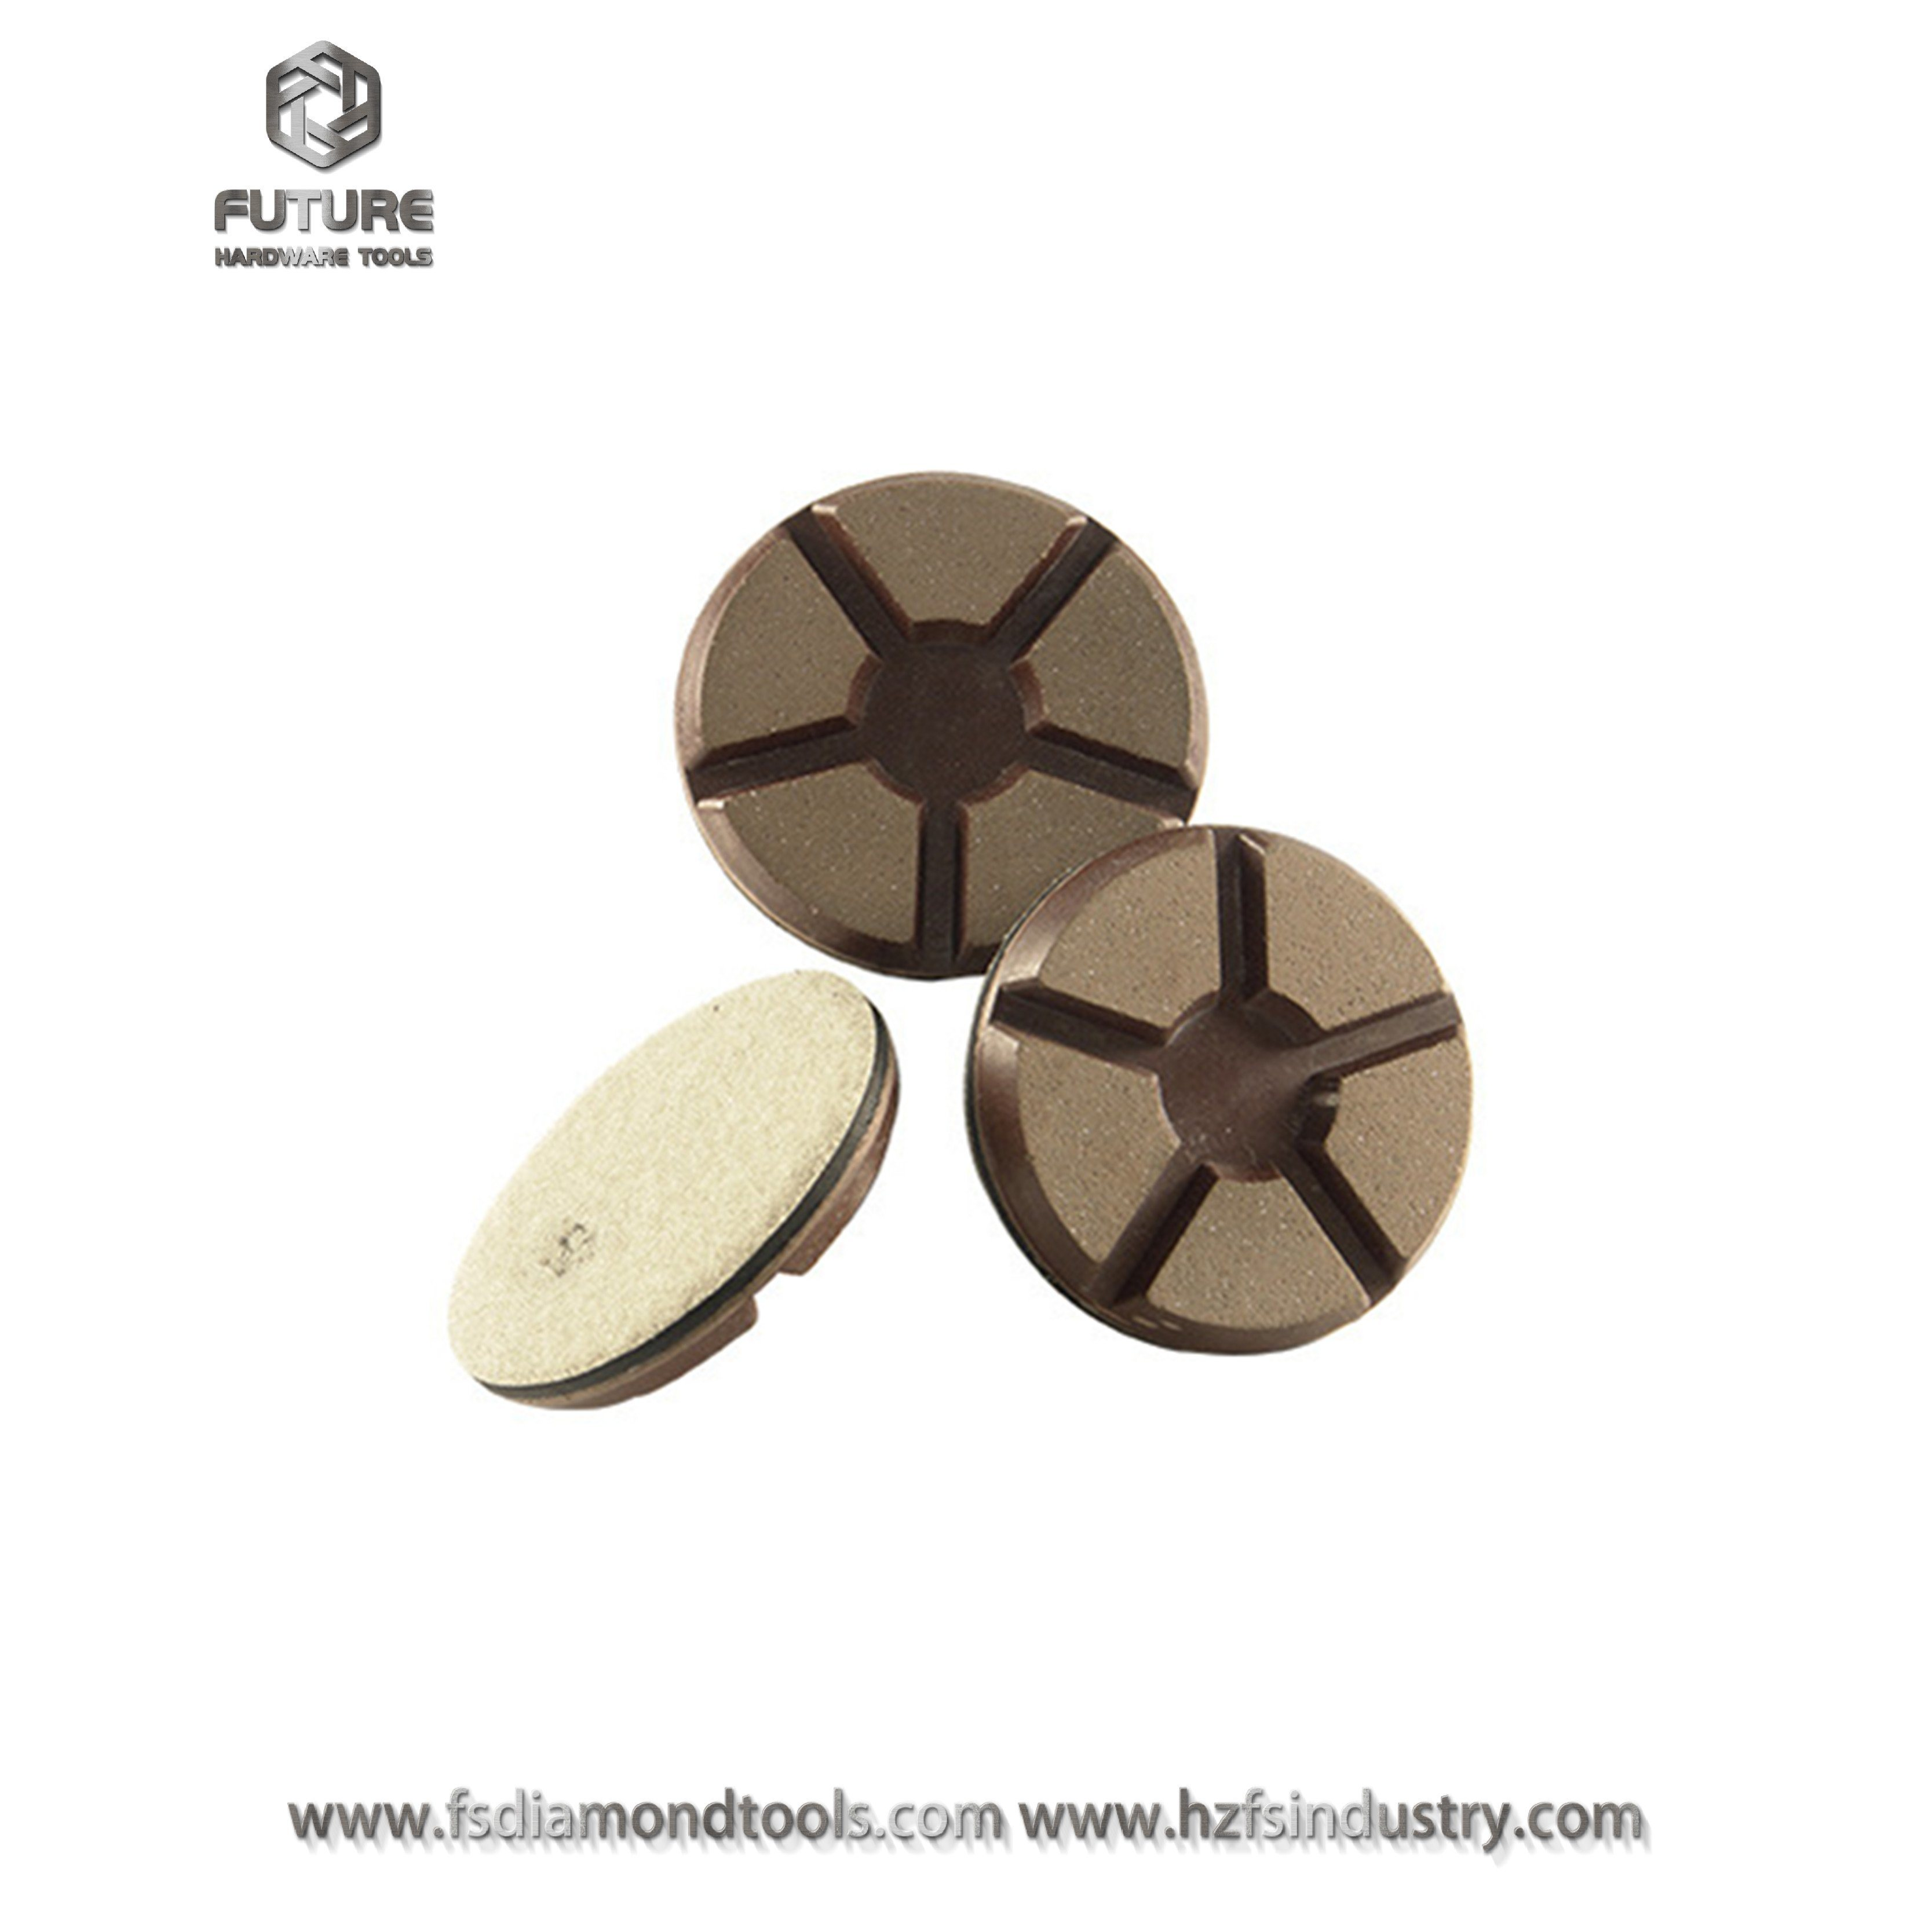 "3"" Copper Bond Hybrid Transitional Diamond Polishing Pad for Concrete"